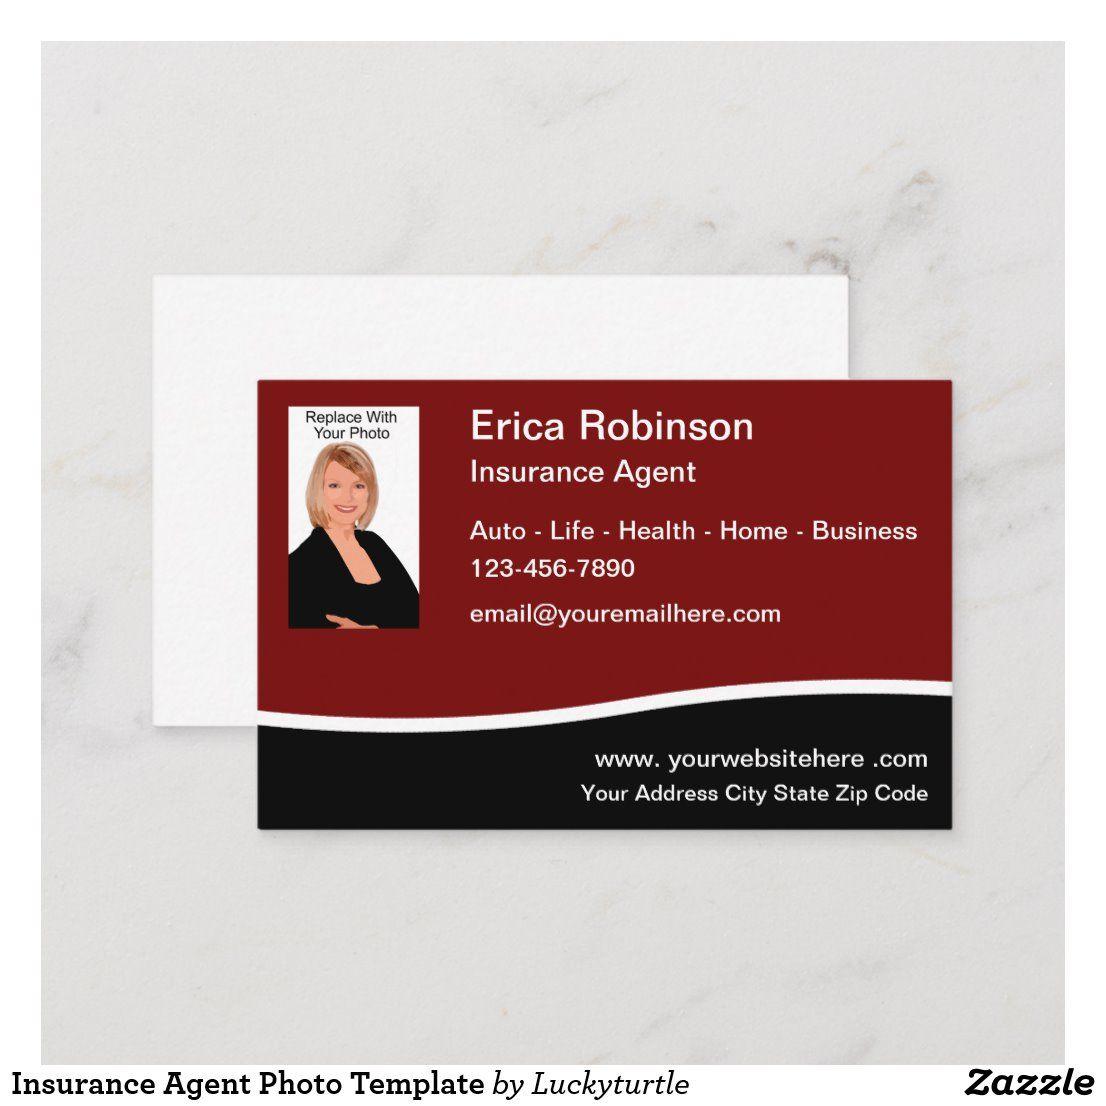 Insurance Agent Photo Template Business Card Zazzle Com Life Insurance Marketing Marketing Business Card Insurance Agent